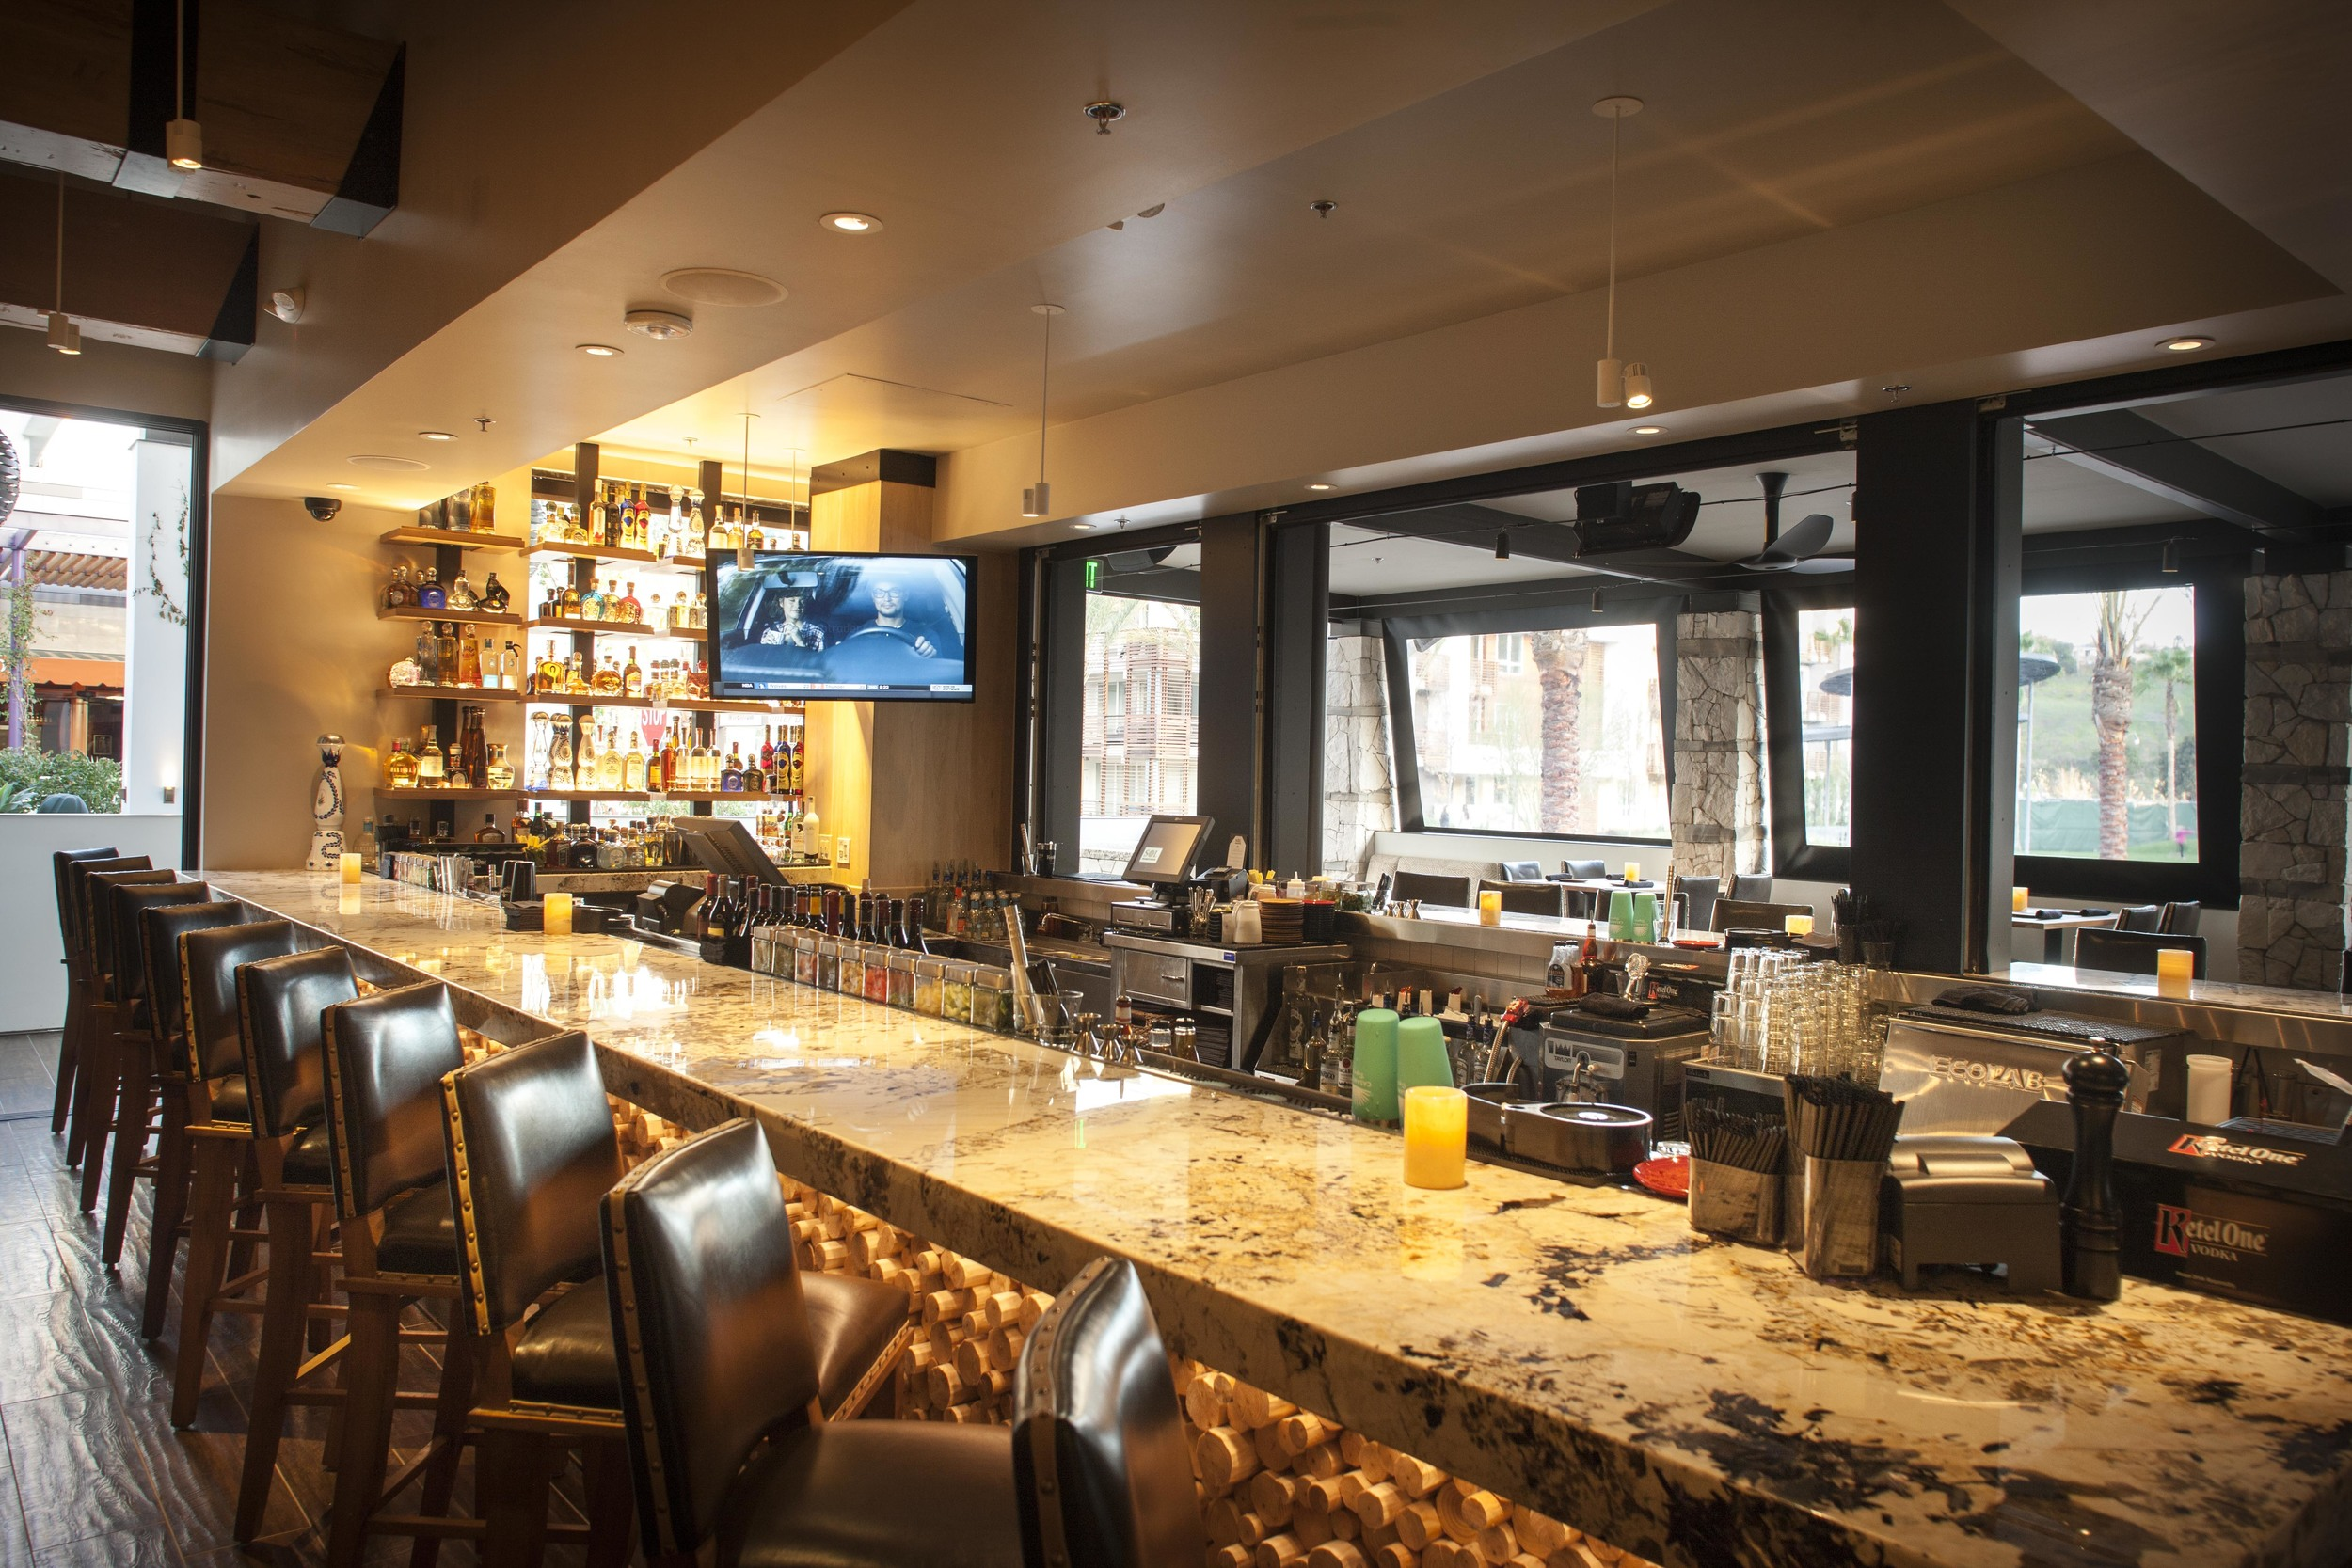 SOL Cocina - Bar Interior 1.jpg